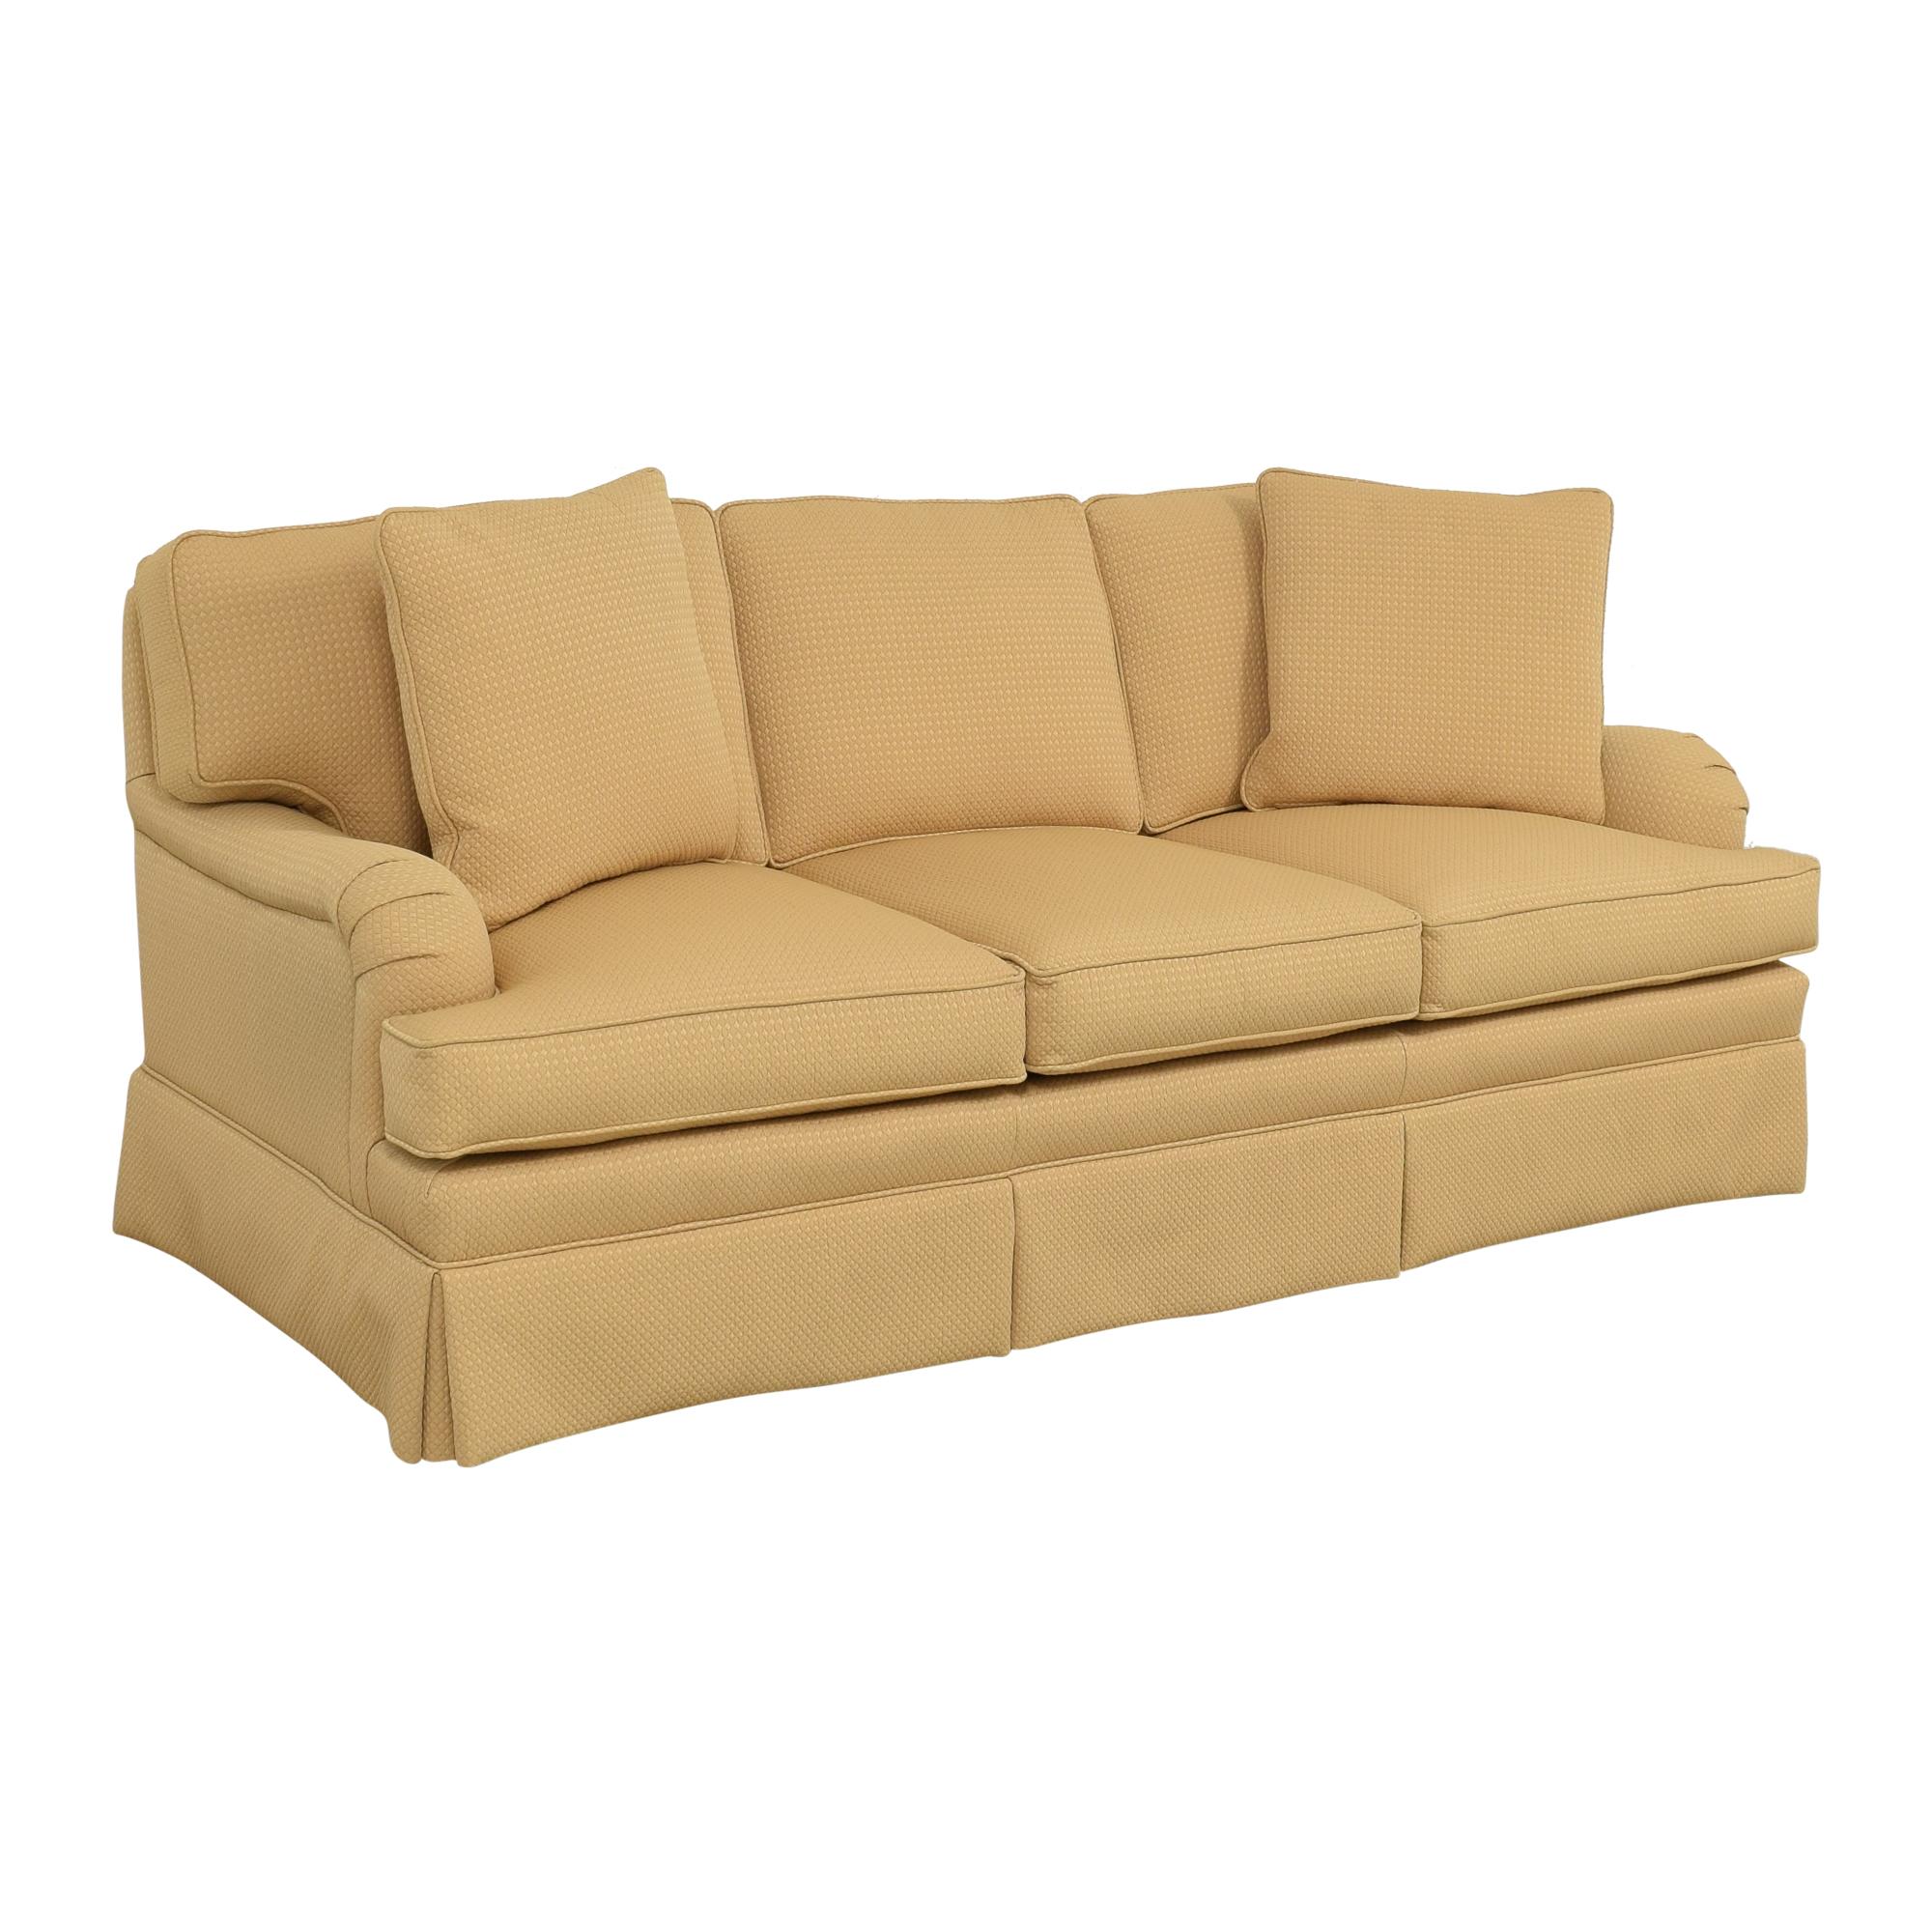 Century Furniture Century Furniture Elegance Sofa nyc